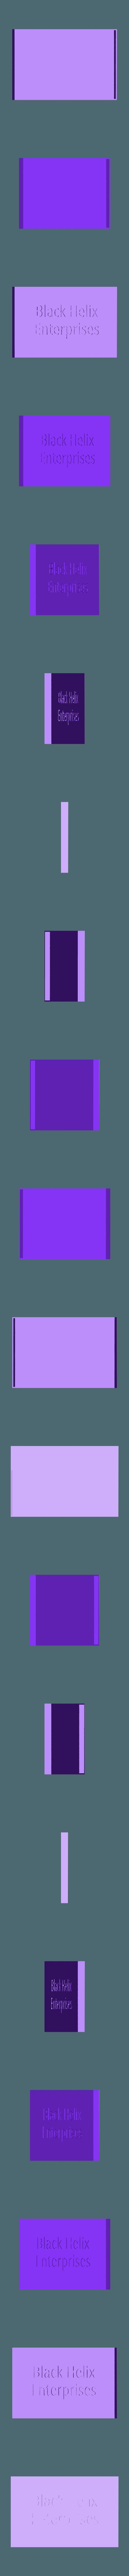 Nexus_Ops_-_Blue_Lid.stl Download free STL file Nexus Ops Insert Cases • 3D printing object, Hardcore3D